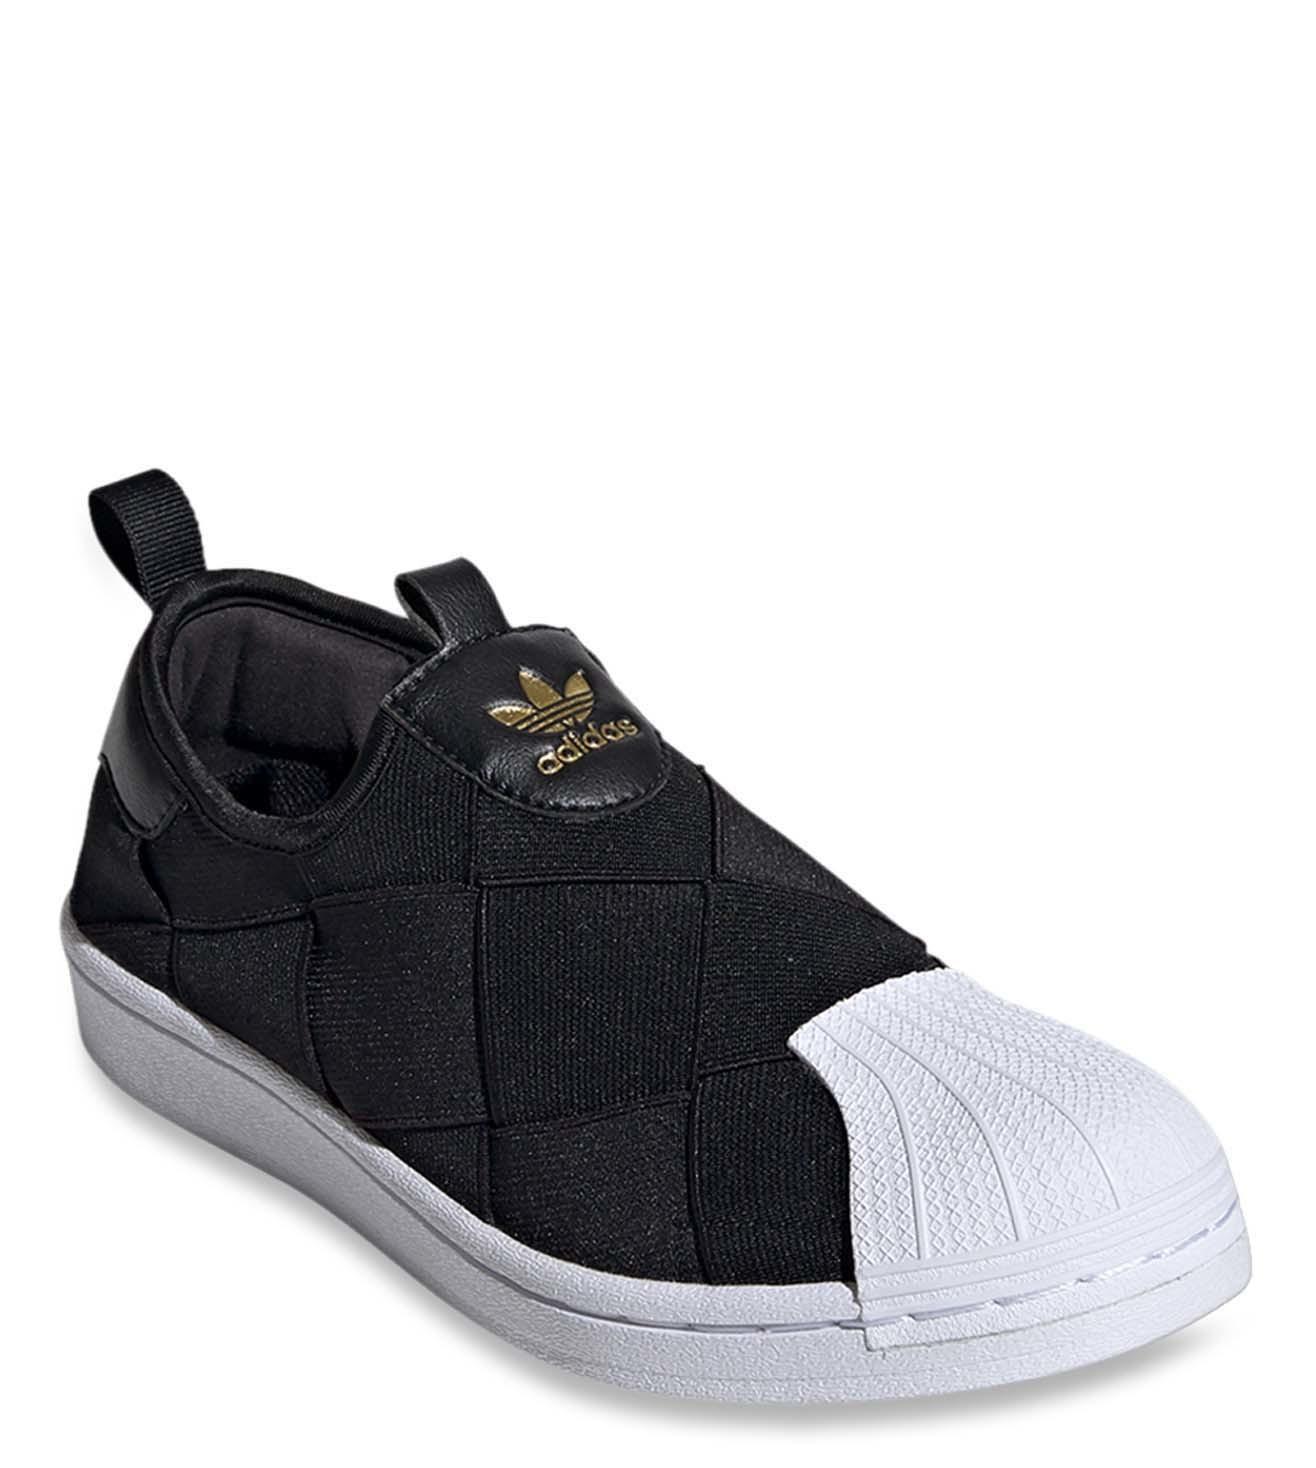 Buy Adidas Originals Black Superstar